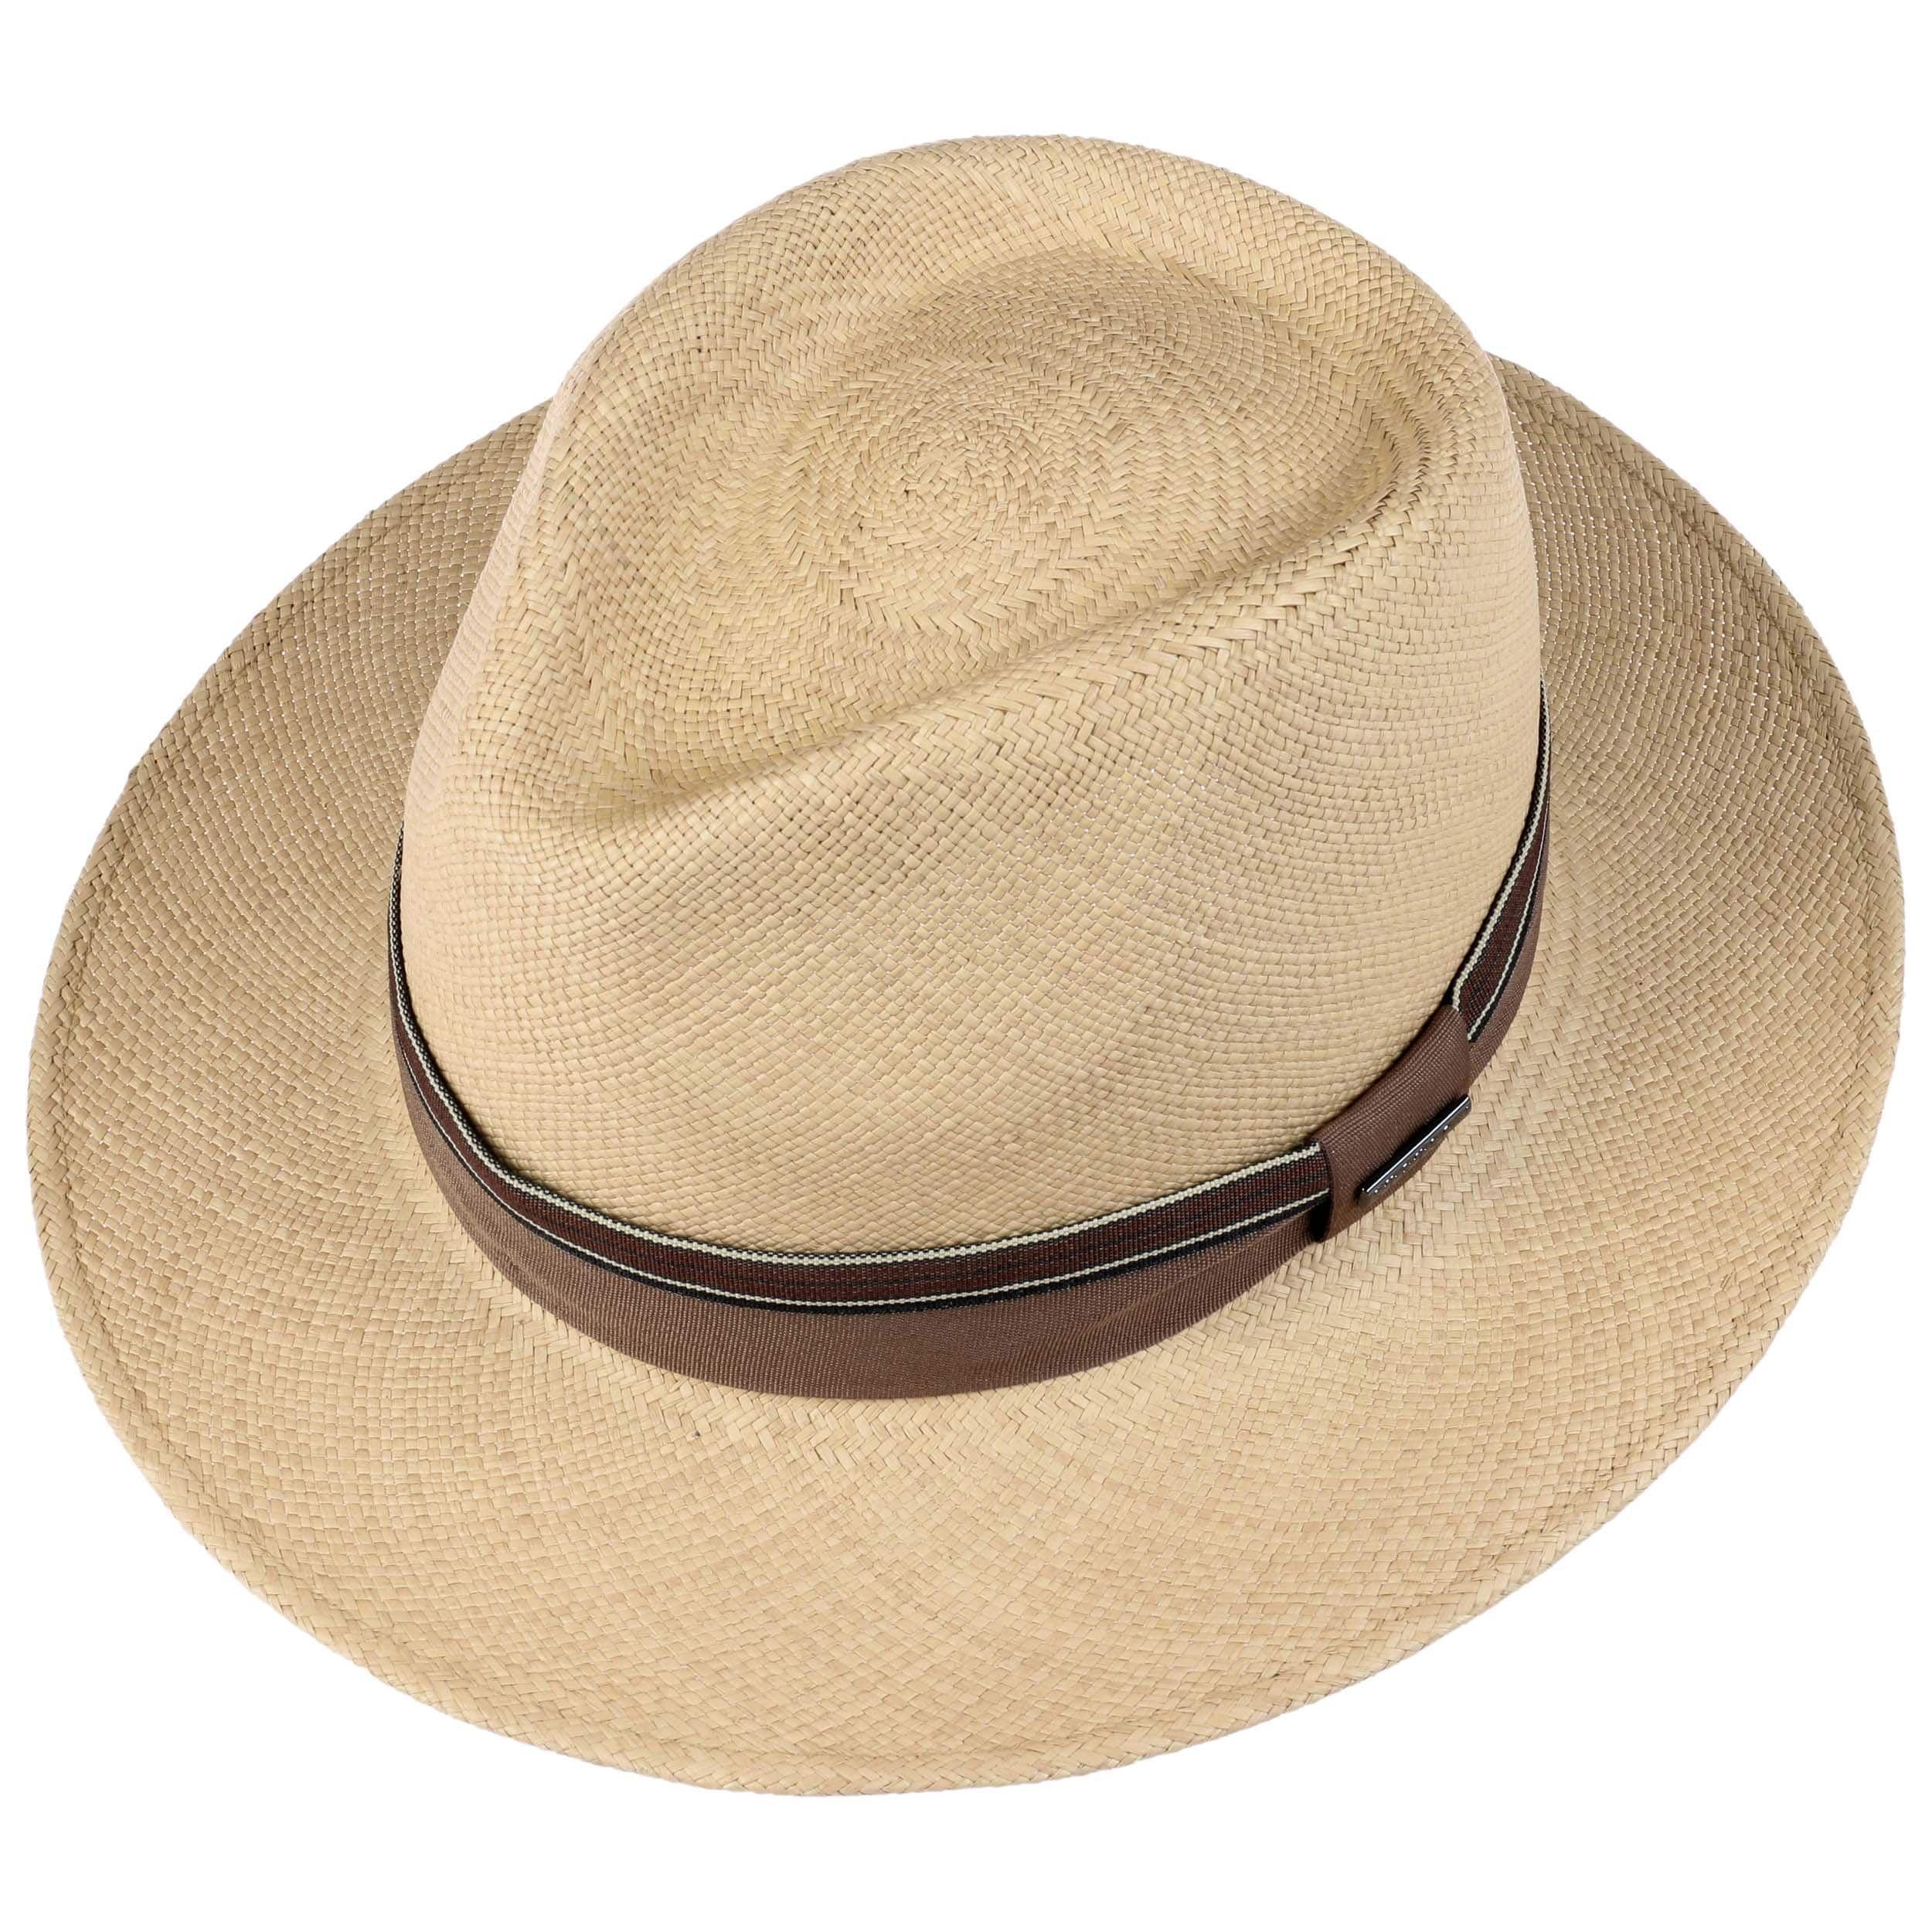 Rushworth Traveller Panamahut natur